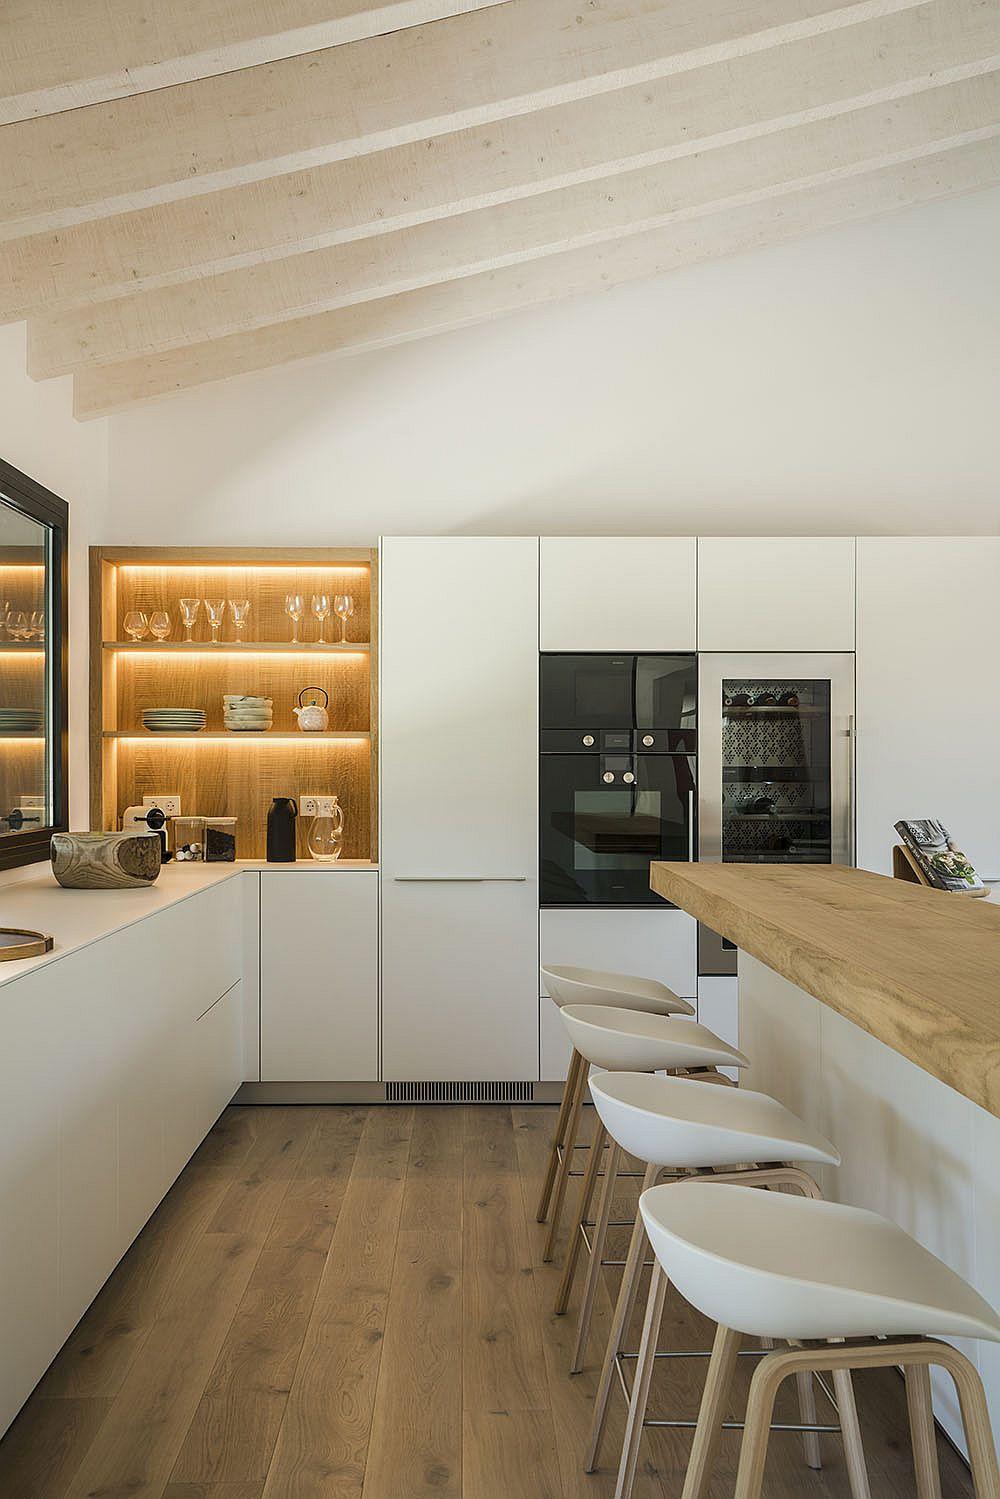 LED strip lighting for the open wooden shelf in kitchen